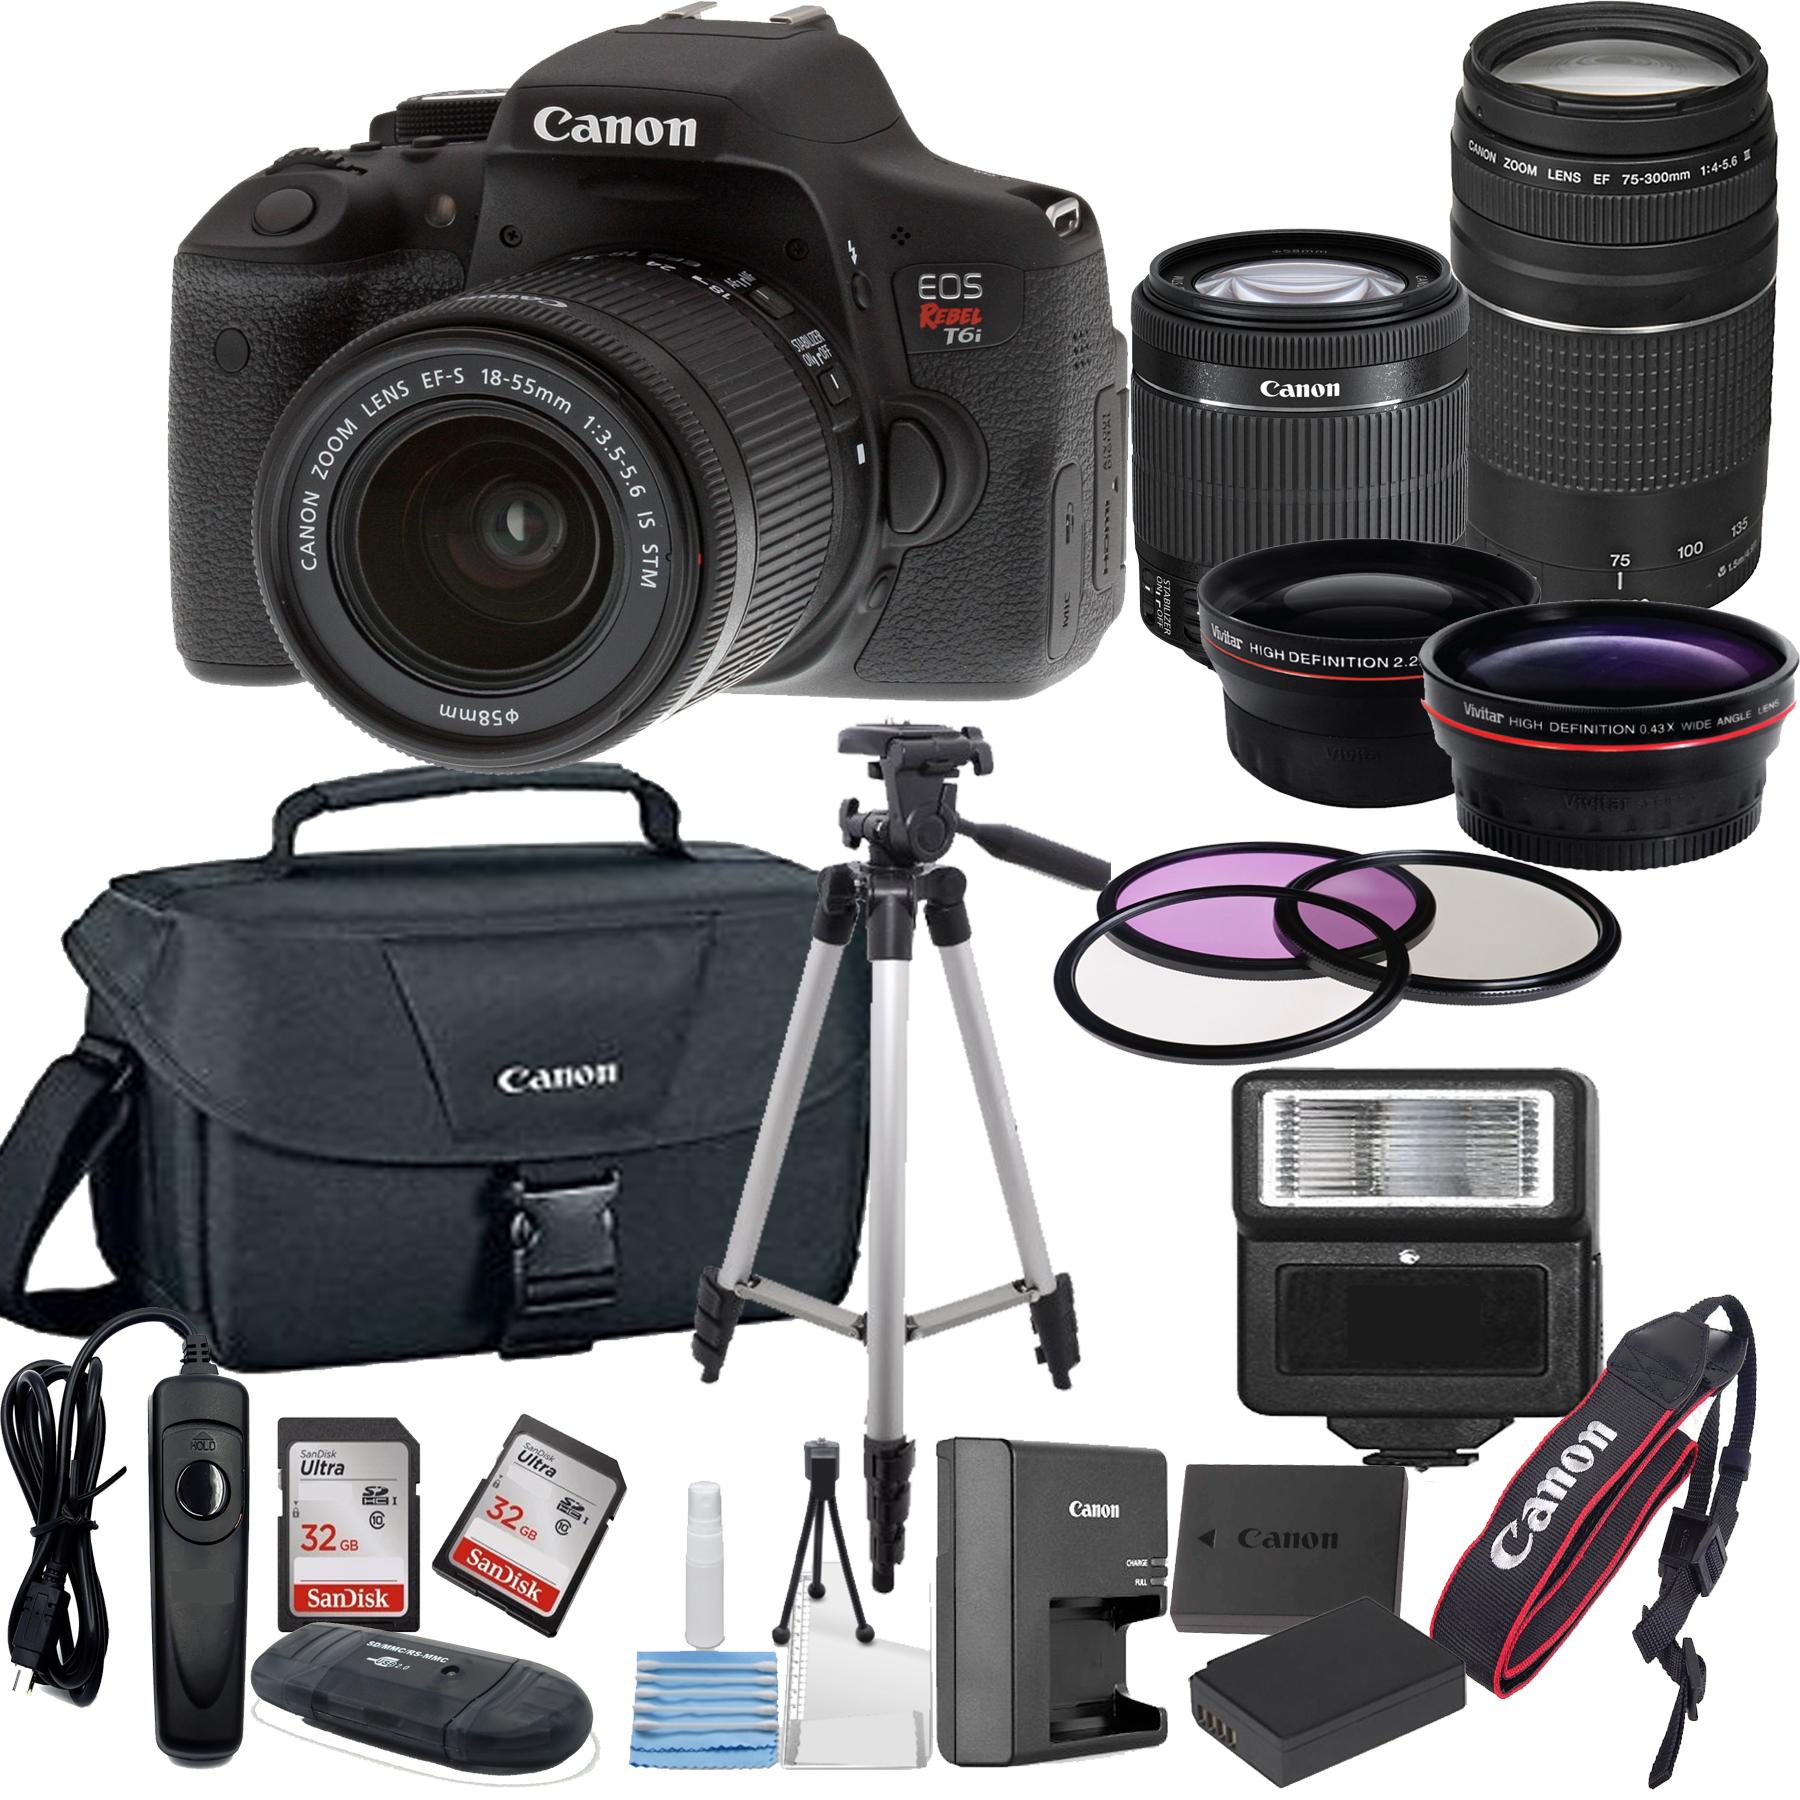 Canon EOS Rebel T6i Digital SLR Camera w/ EF-S 18-55mm + 75